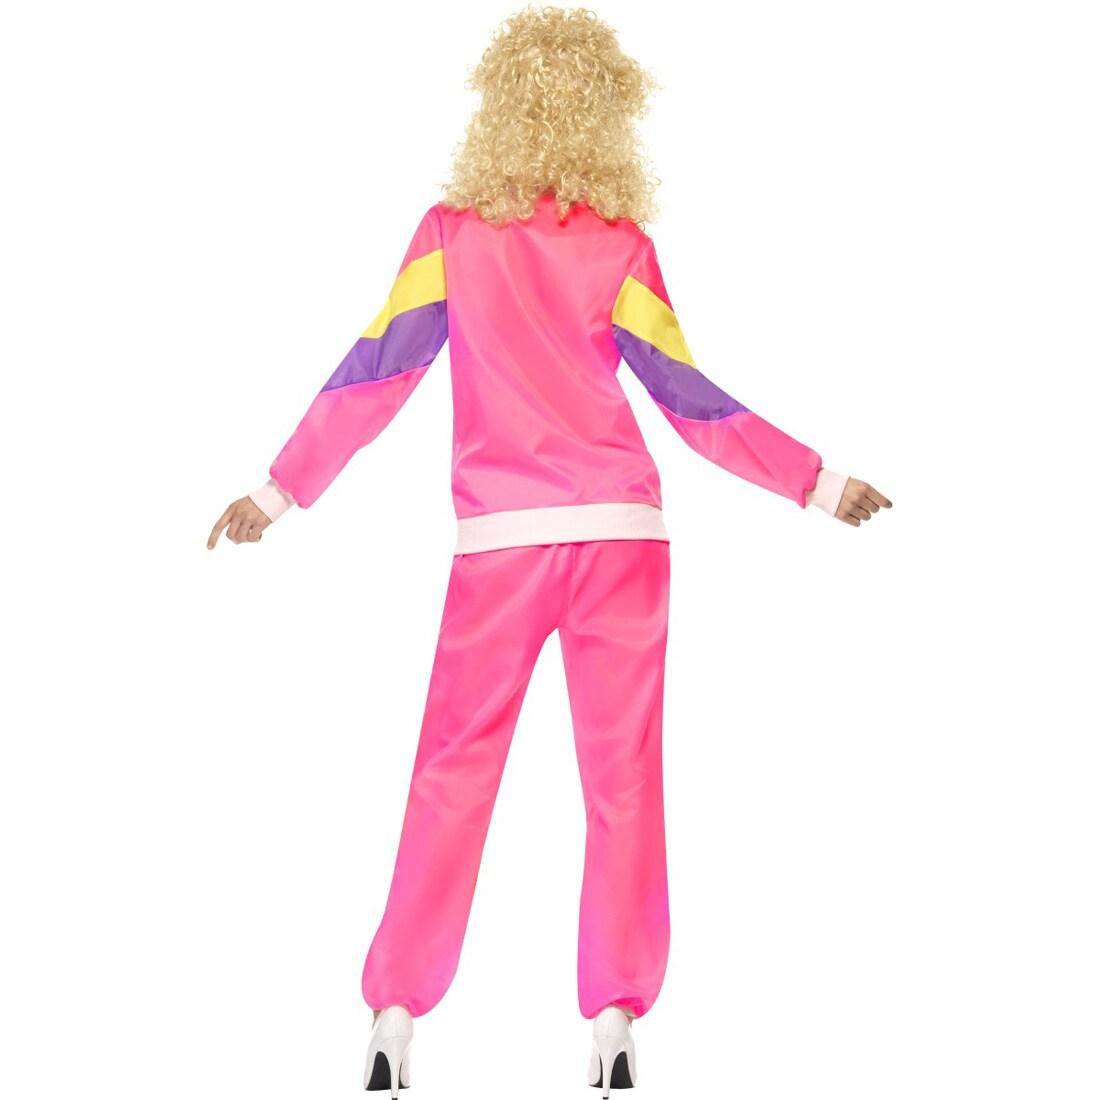 trainingsanzug kost m 80er jahre outfit damen jogginganzug. Black Bedroom Furniture Sets. Home Design Ideas